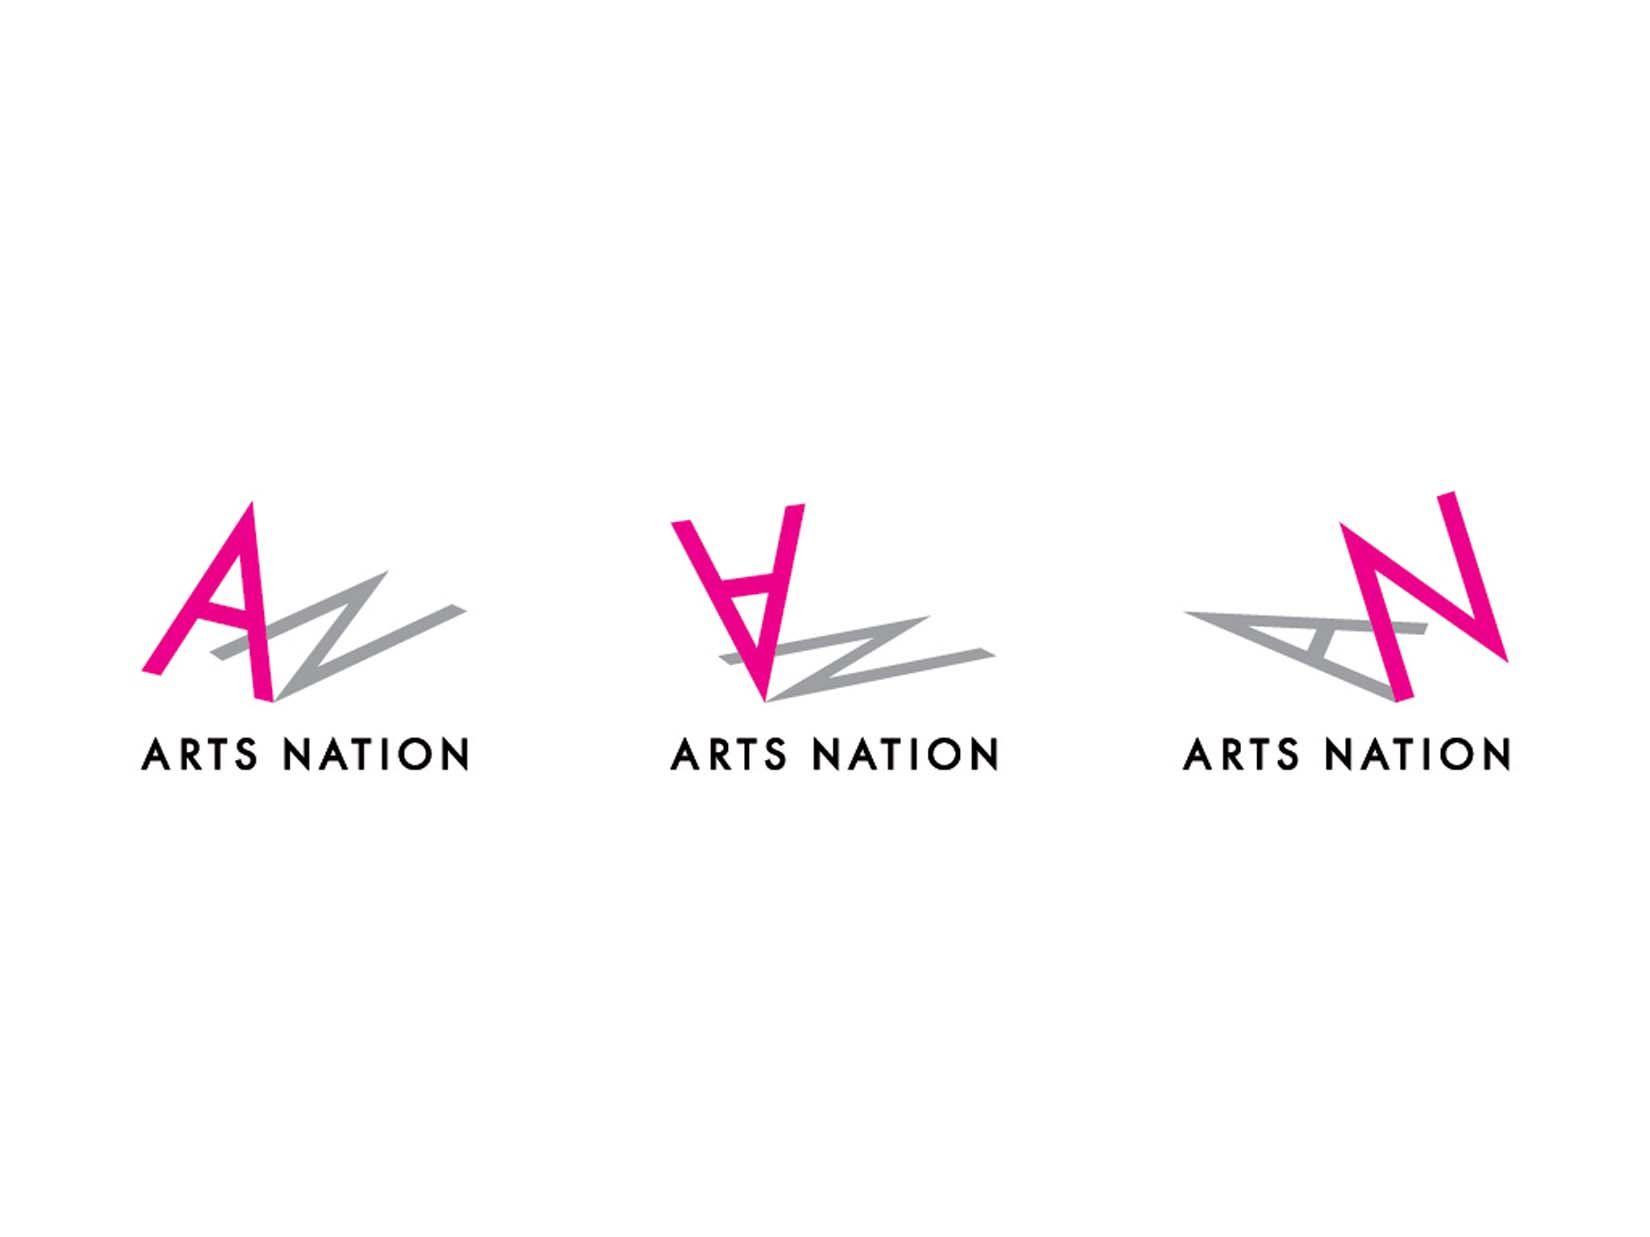 WMH-ARTS-NATION-BRAND-IDENTITY-LOGO-WEB image